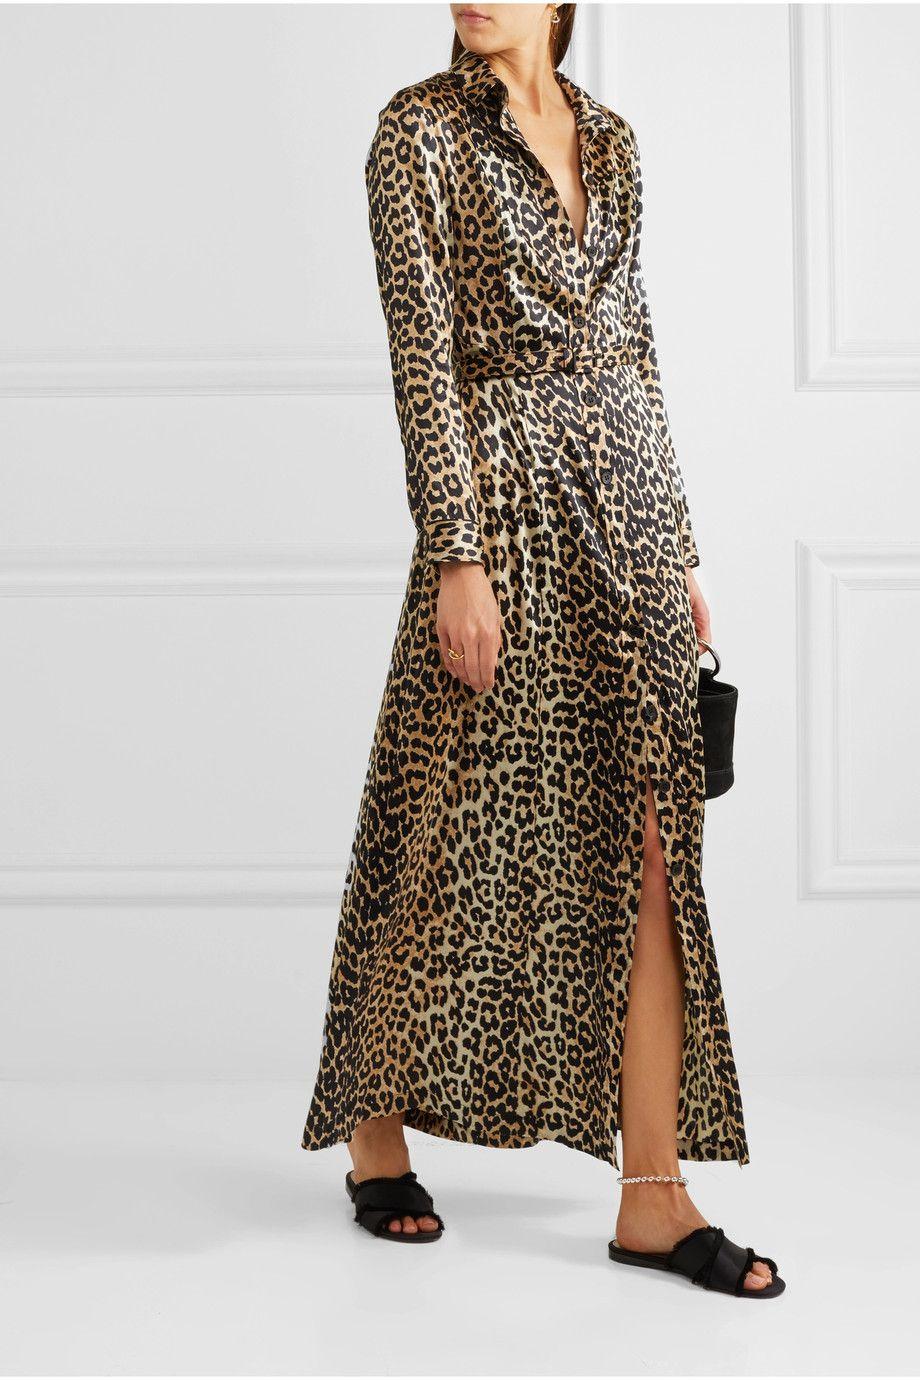 884fee558a6 GANNI - Dufort leopard-print silk-blend satin maxi dress | Fashion ...